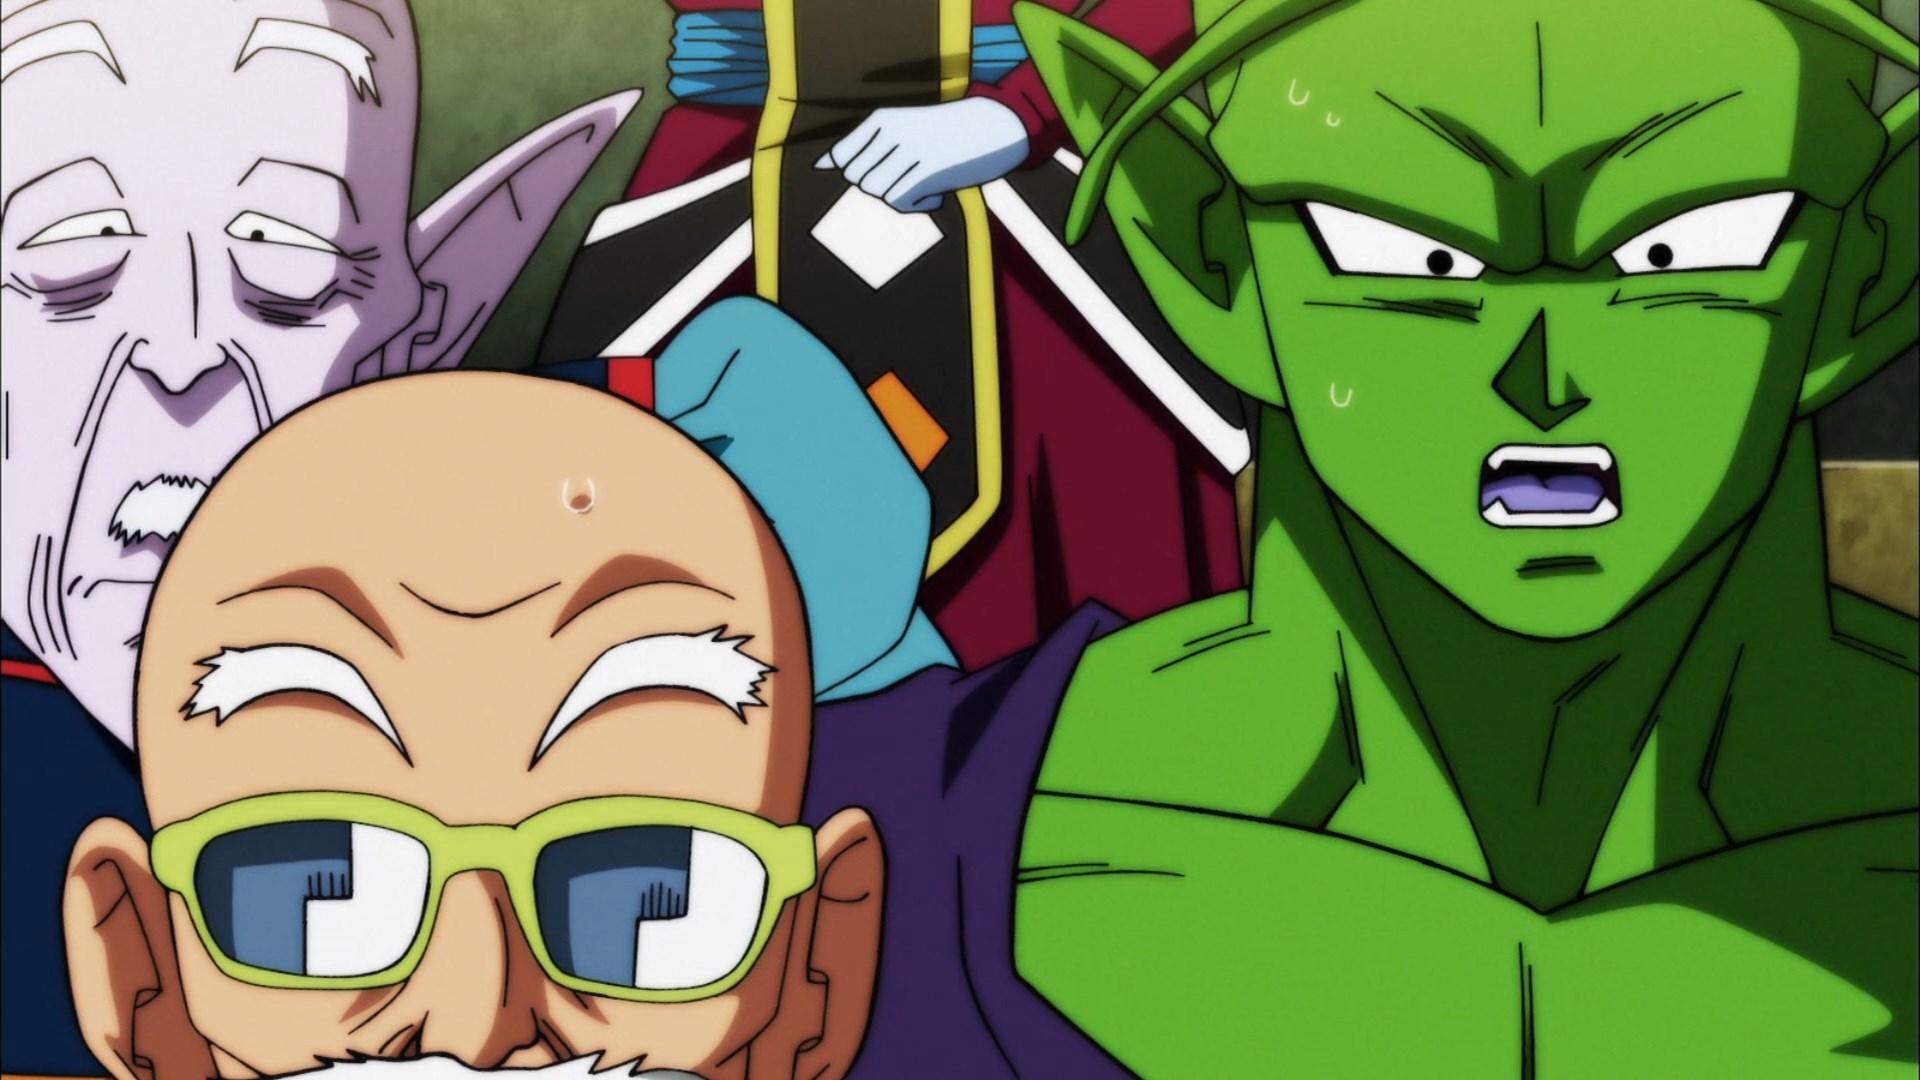 [HorribleSubs] Dragon Ball Super - 121 [1080p].mkv_snapshot_09.43